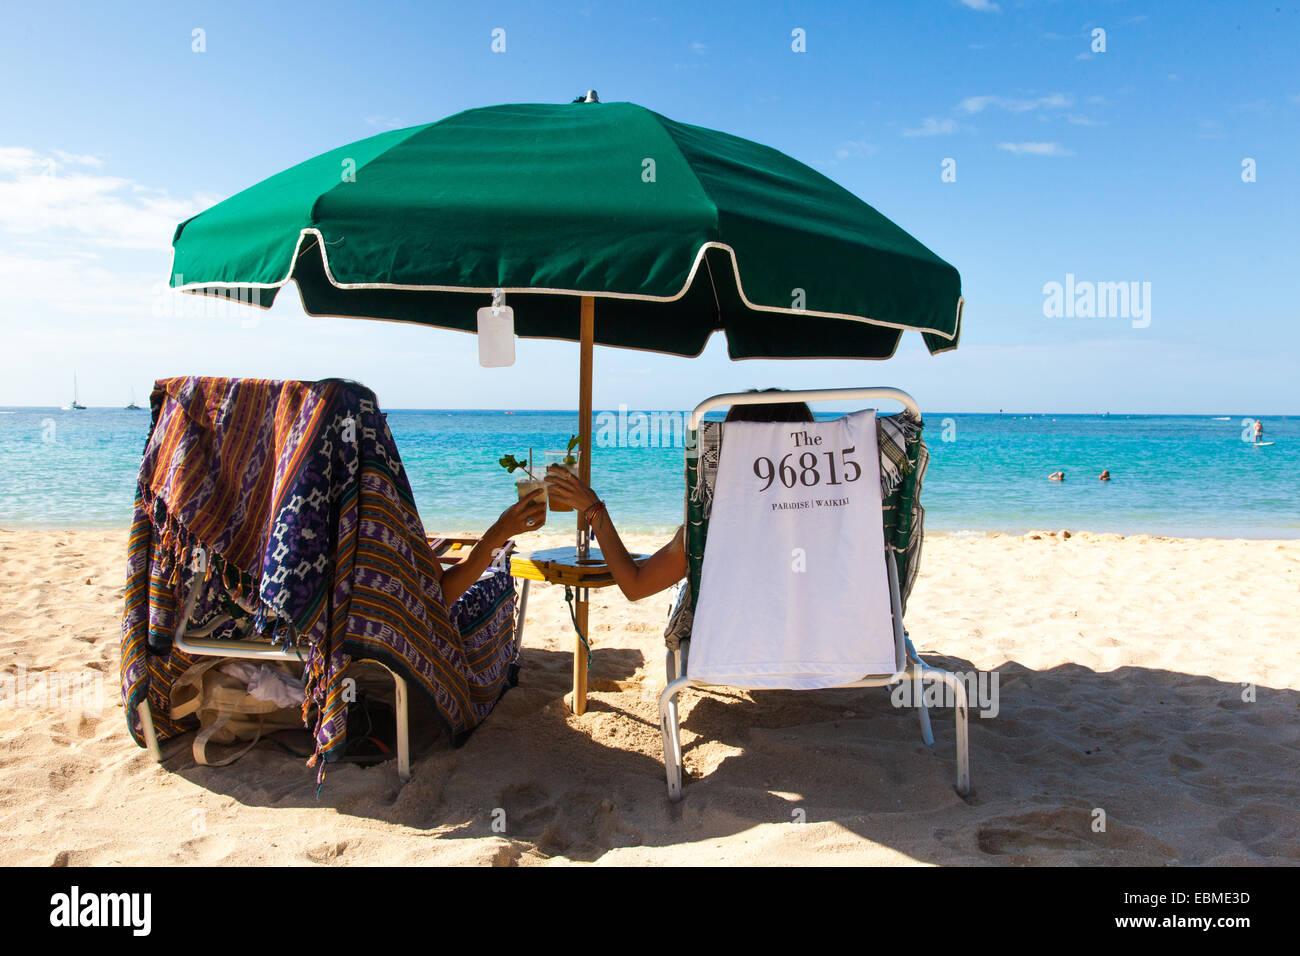 Two Woman Enjoying A Drink On The Beach Under Umbrella